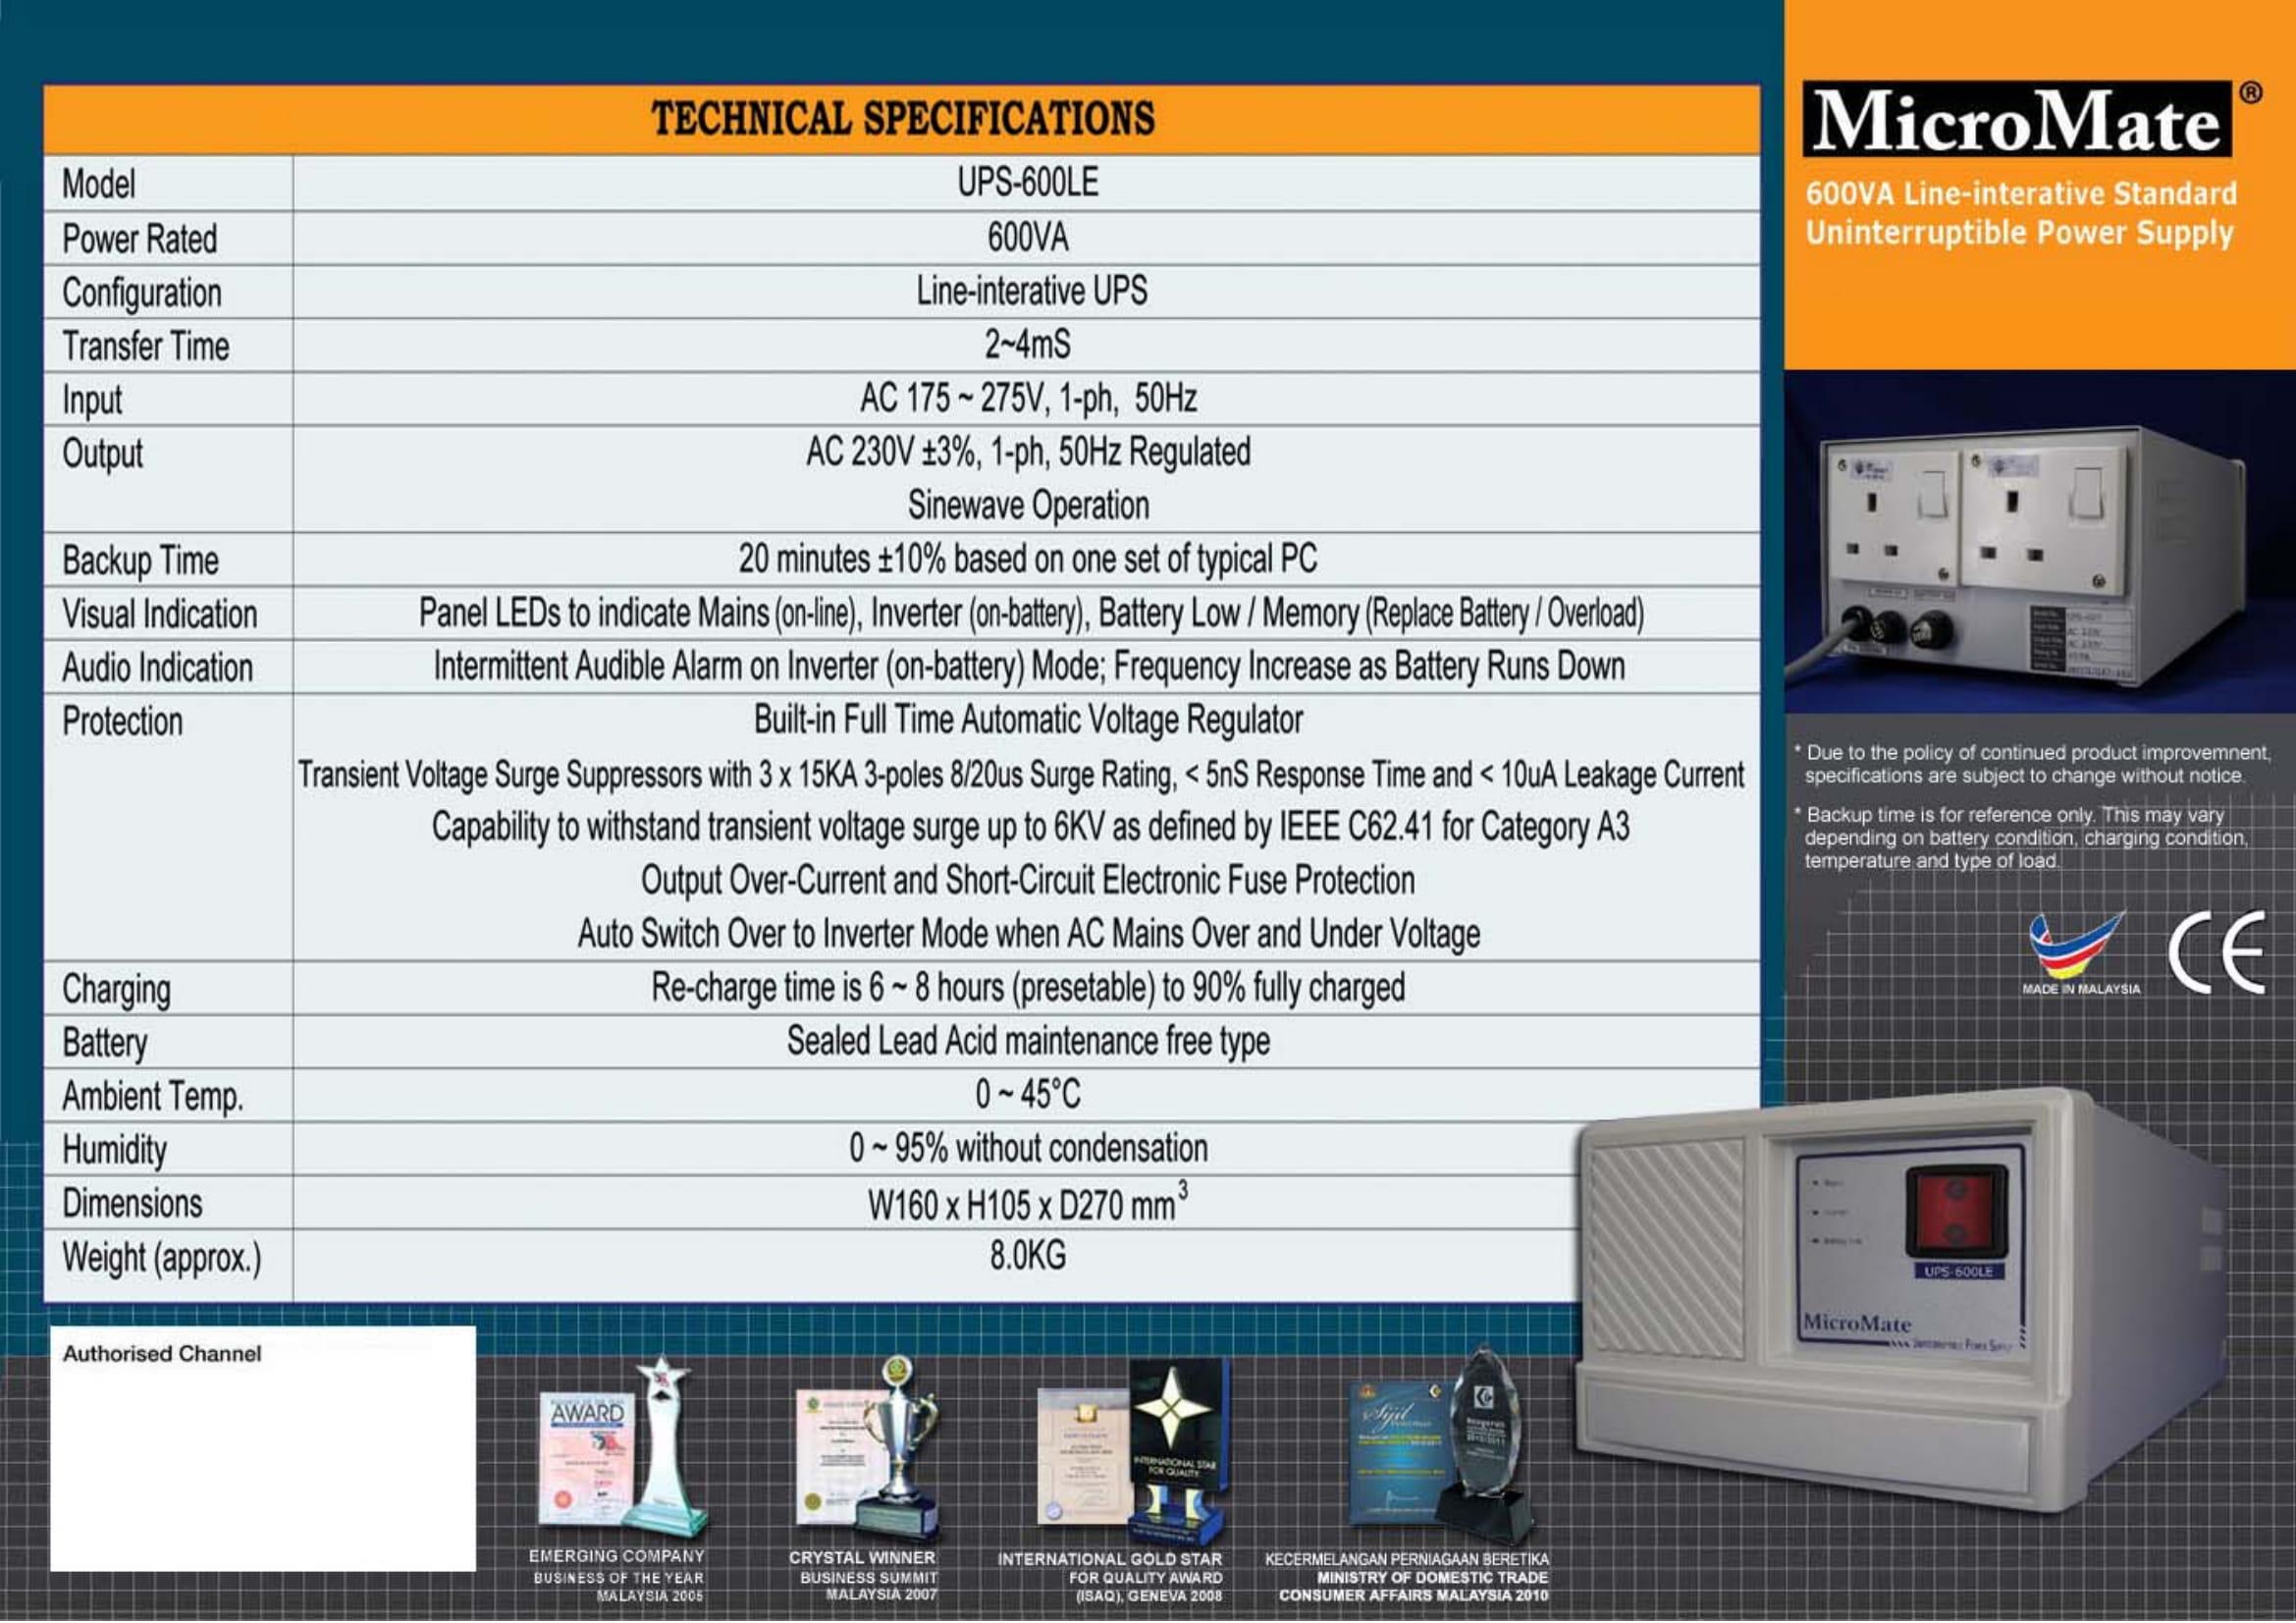 Line Interative Ups Full Range Of Malaysia Kuala Lumpur Kl Backup Mate Battery Power Supply For Device Ac Dc Or 1 Phase 600va